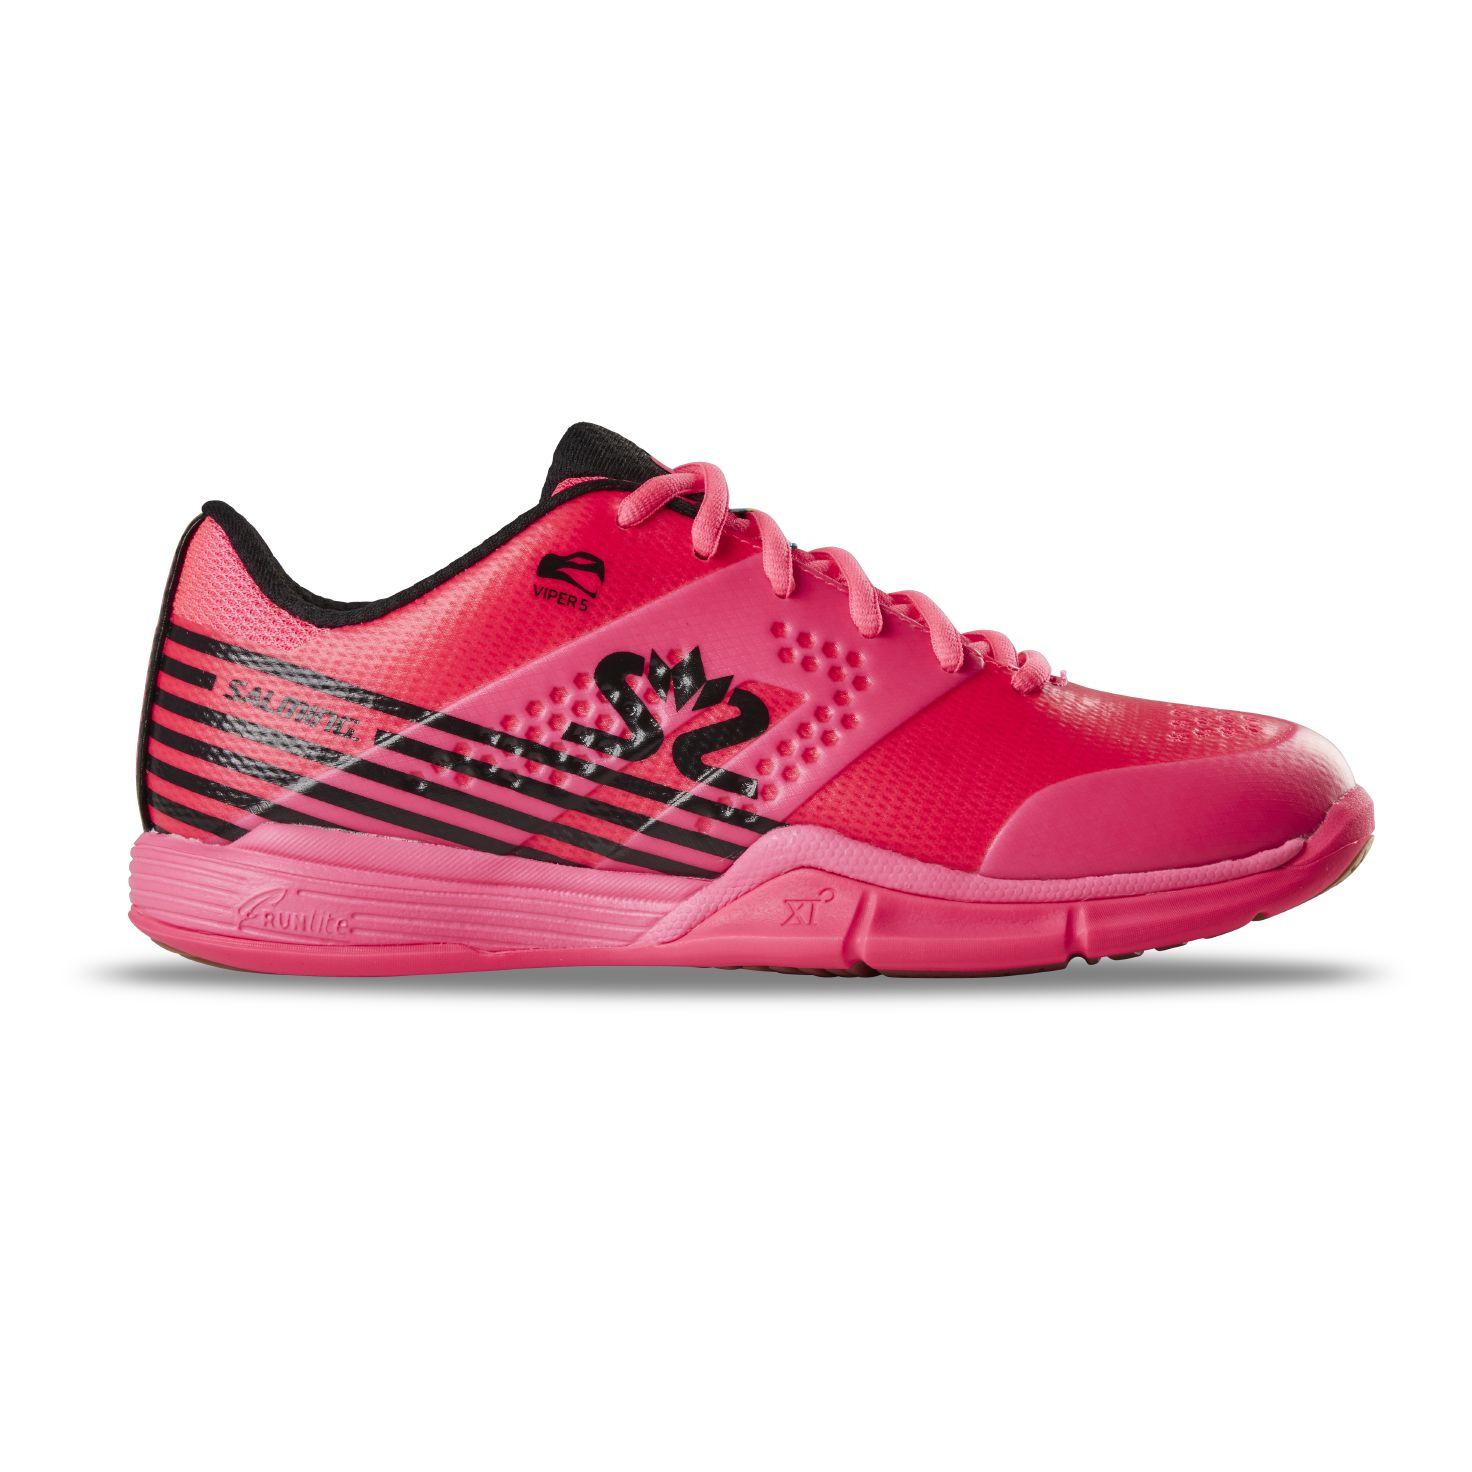 Salming Viper 5 Shoe Women Pink/Black 6,5 UK - 40 EUR - 25,5 cm